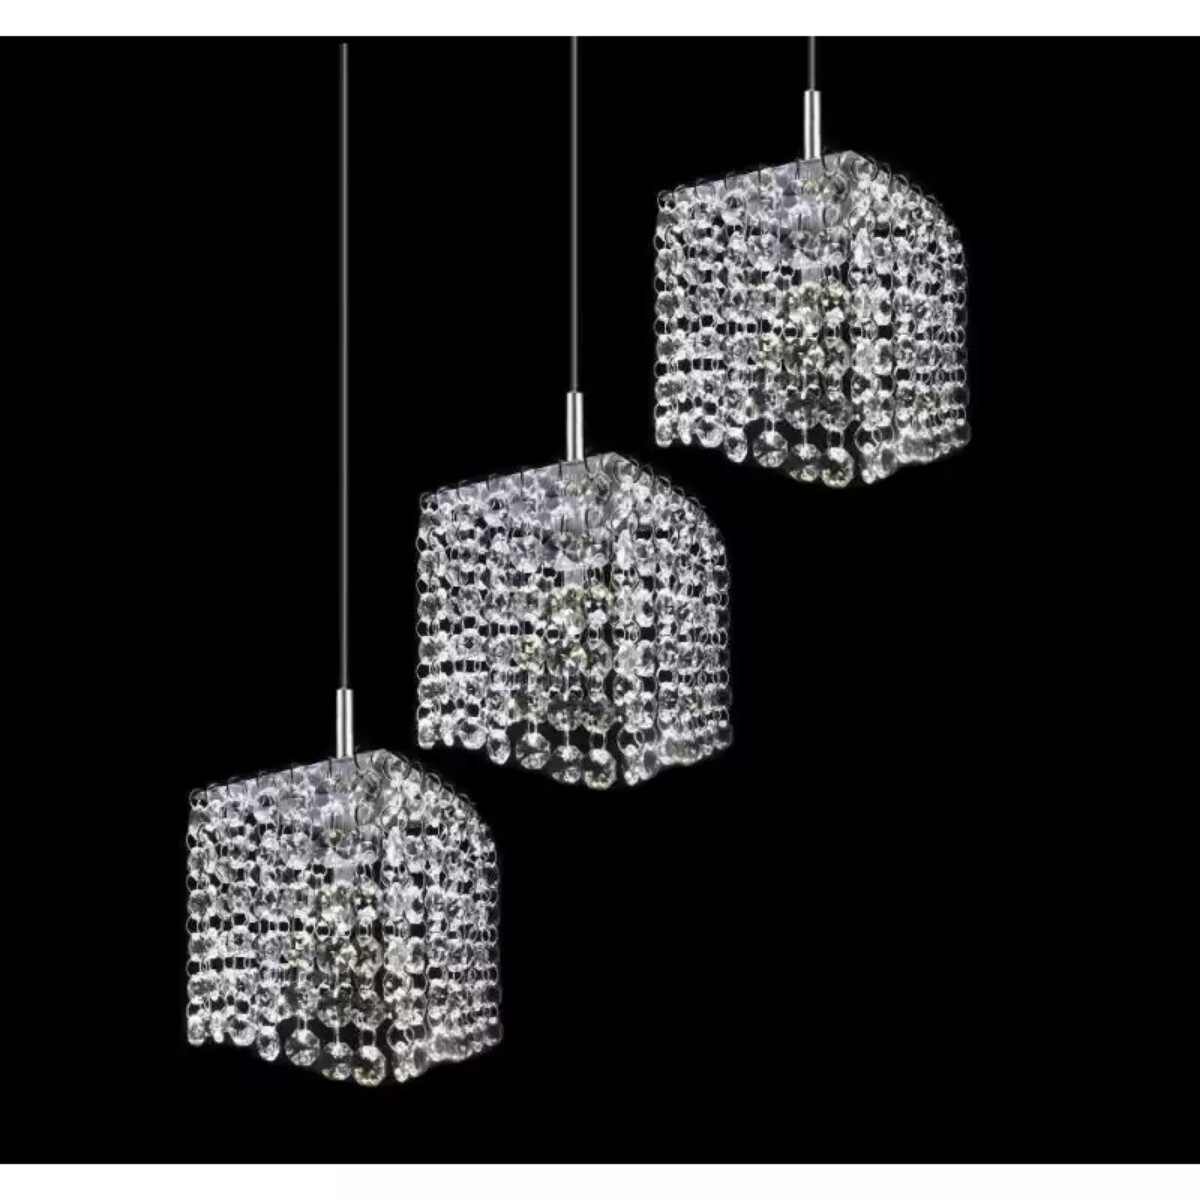 lustre plafon pendente de cristal cp design ilumina o. Black Bedroom Furniture Sets. Home Design Ideas